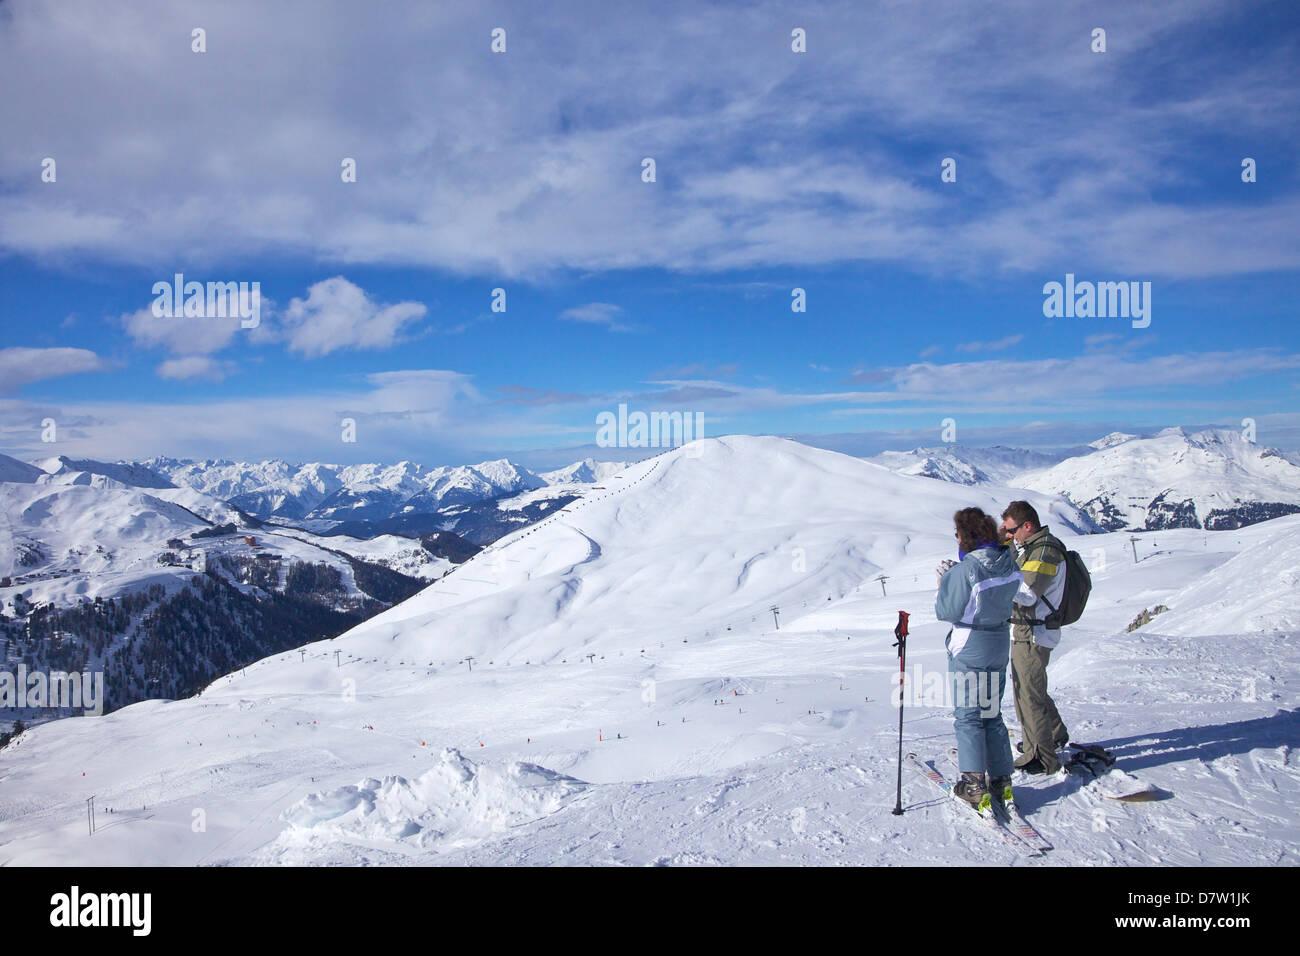 View of La Plagne, Savoie, French Alps, France - Stock Image